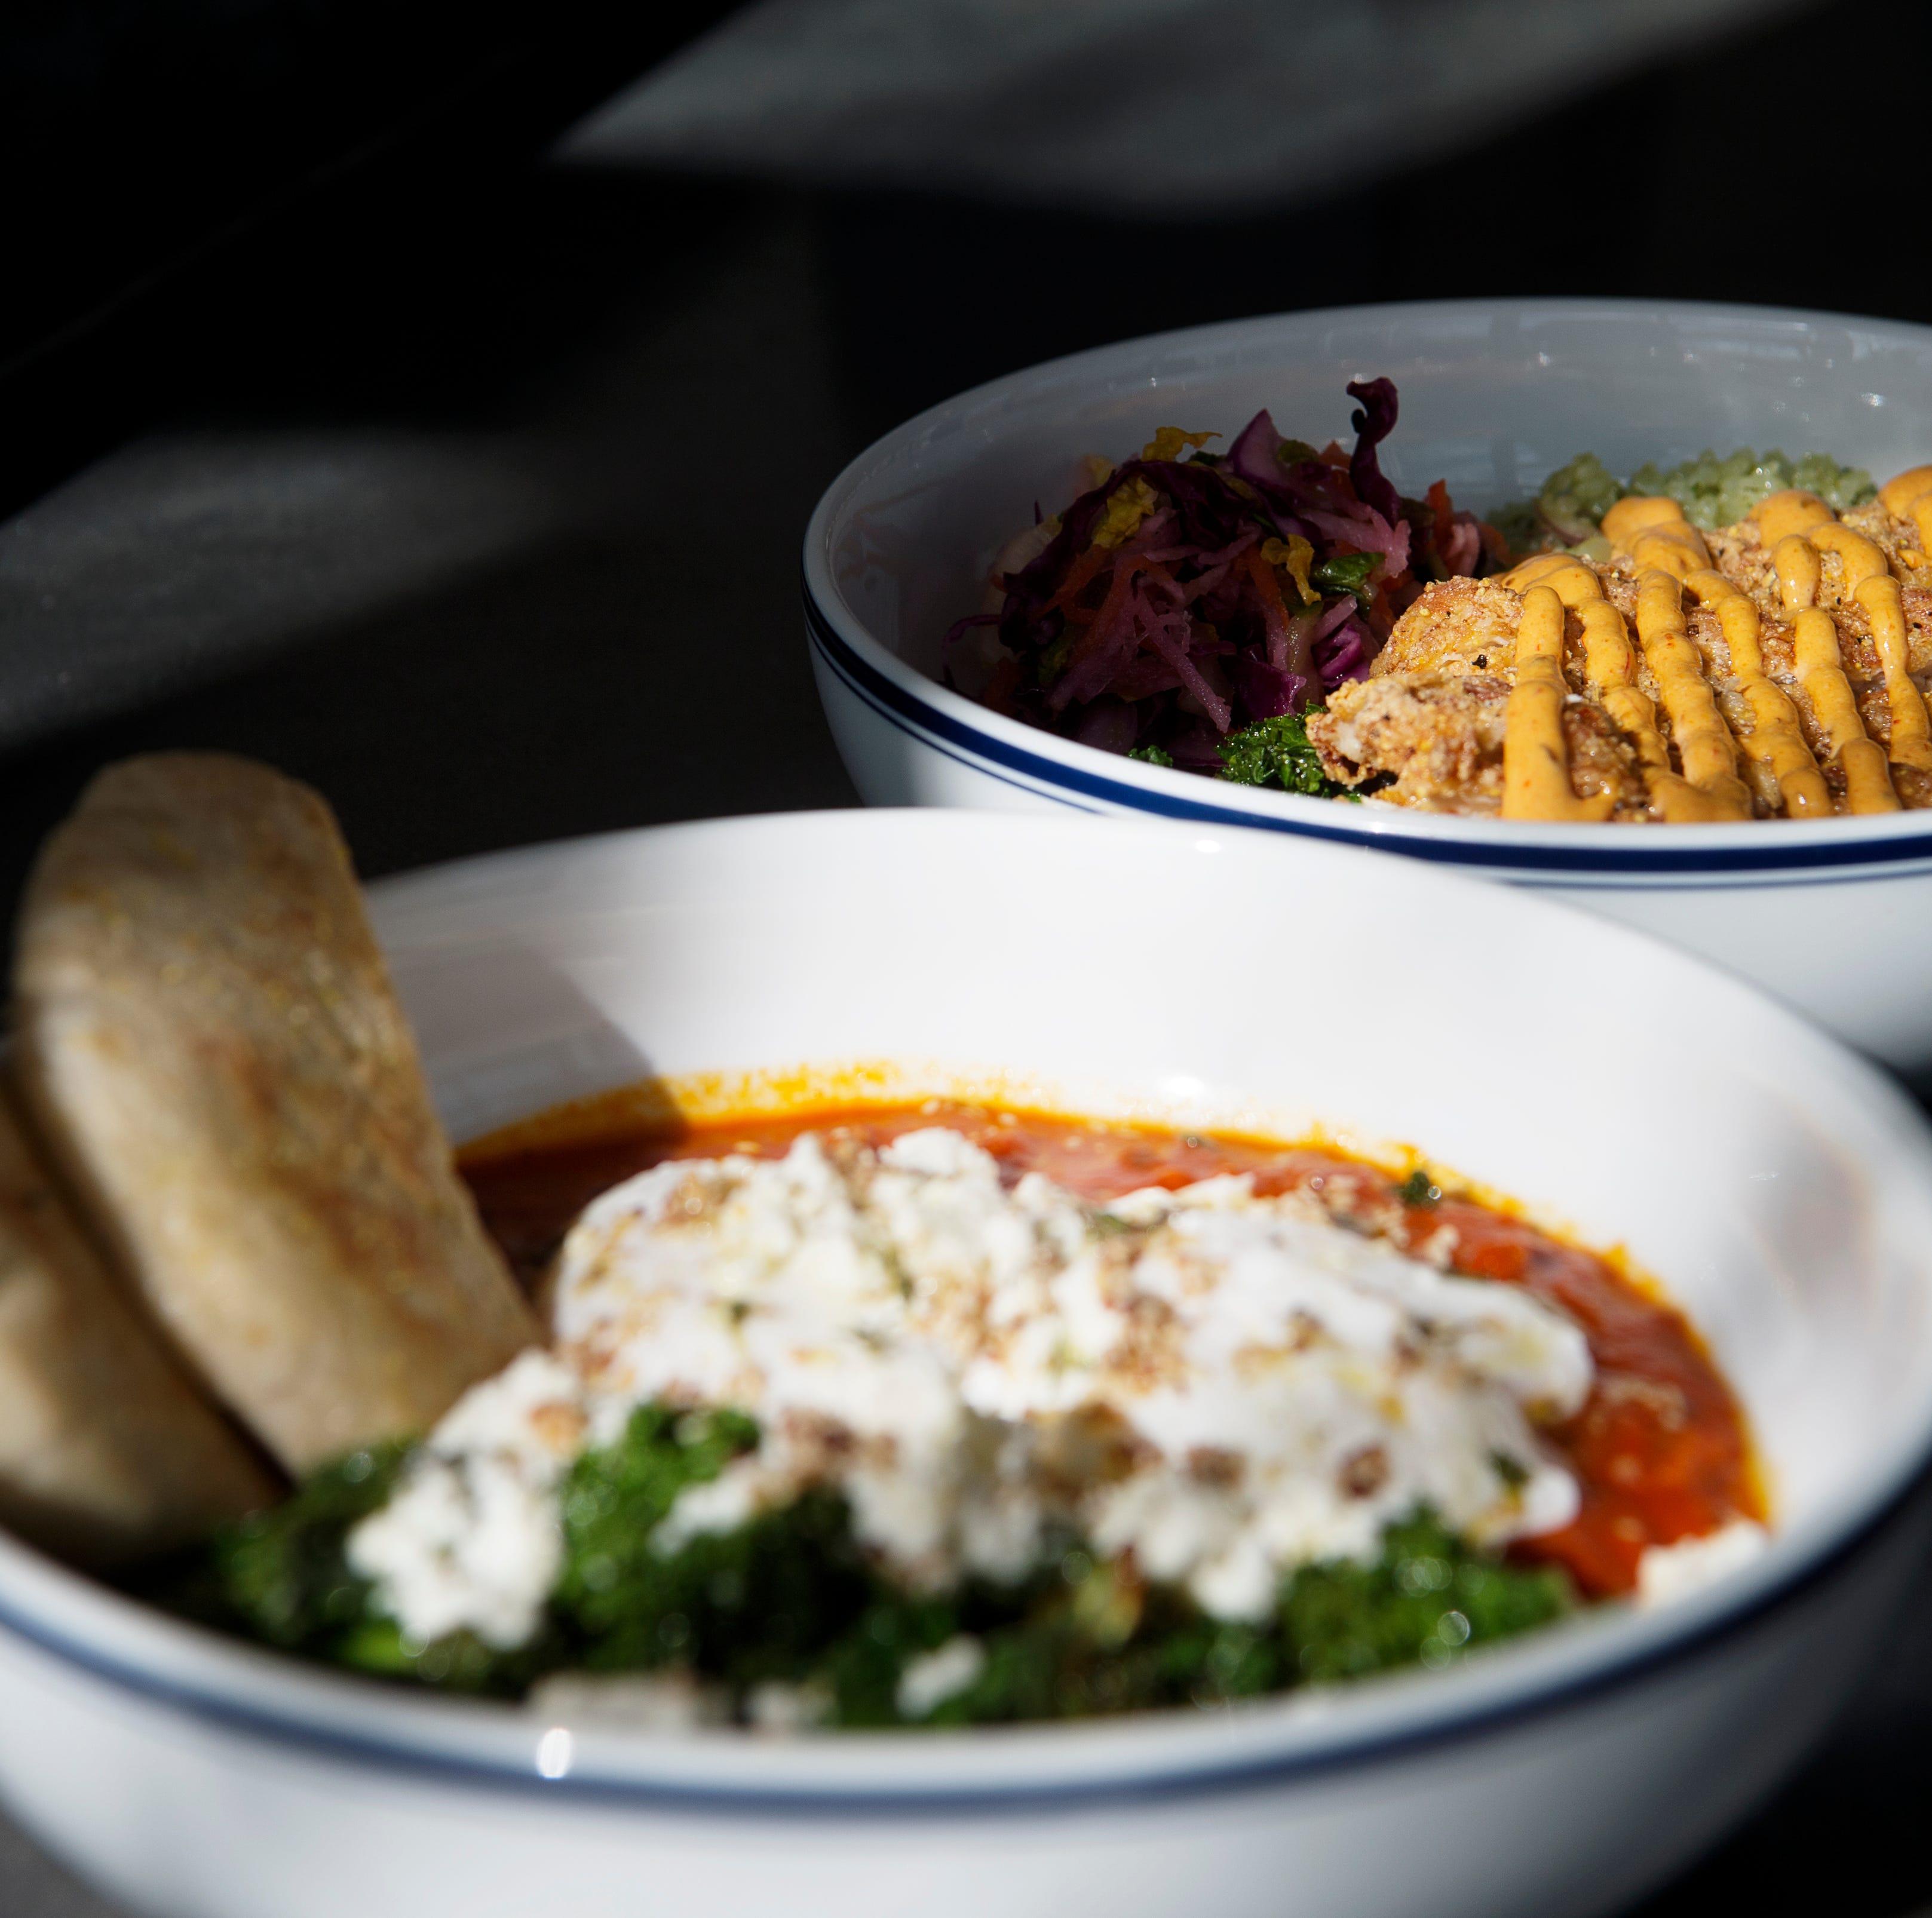 Food writer's Mackensy Lunsford's 6 picks for Mother's Day brunch